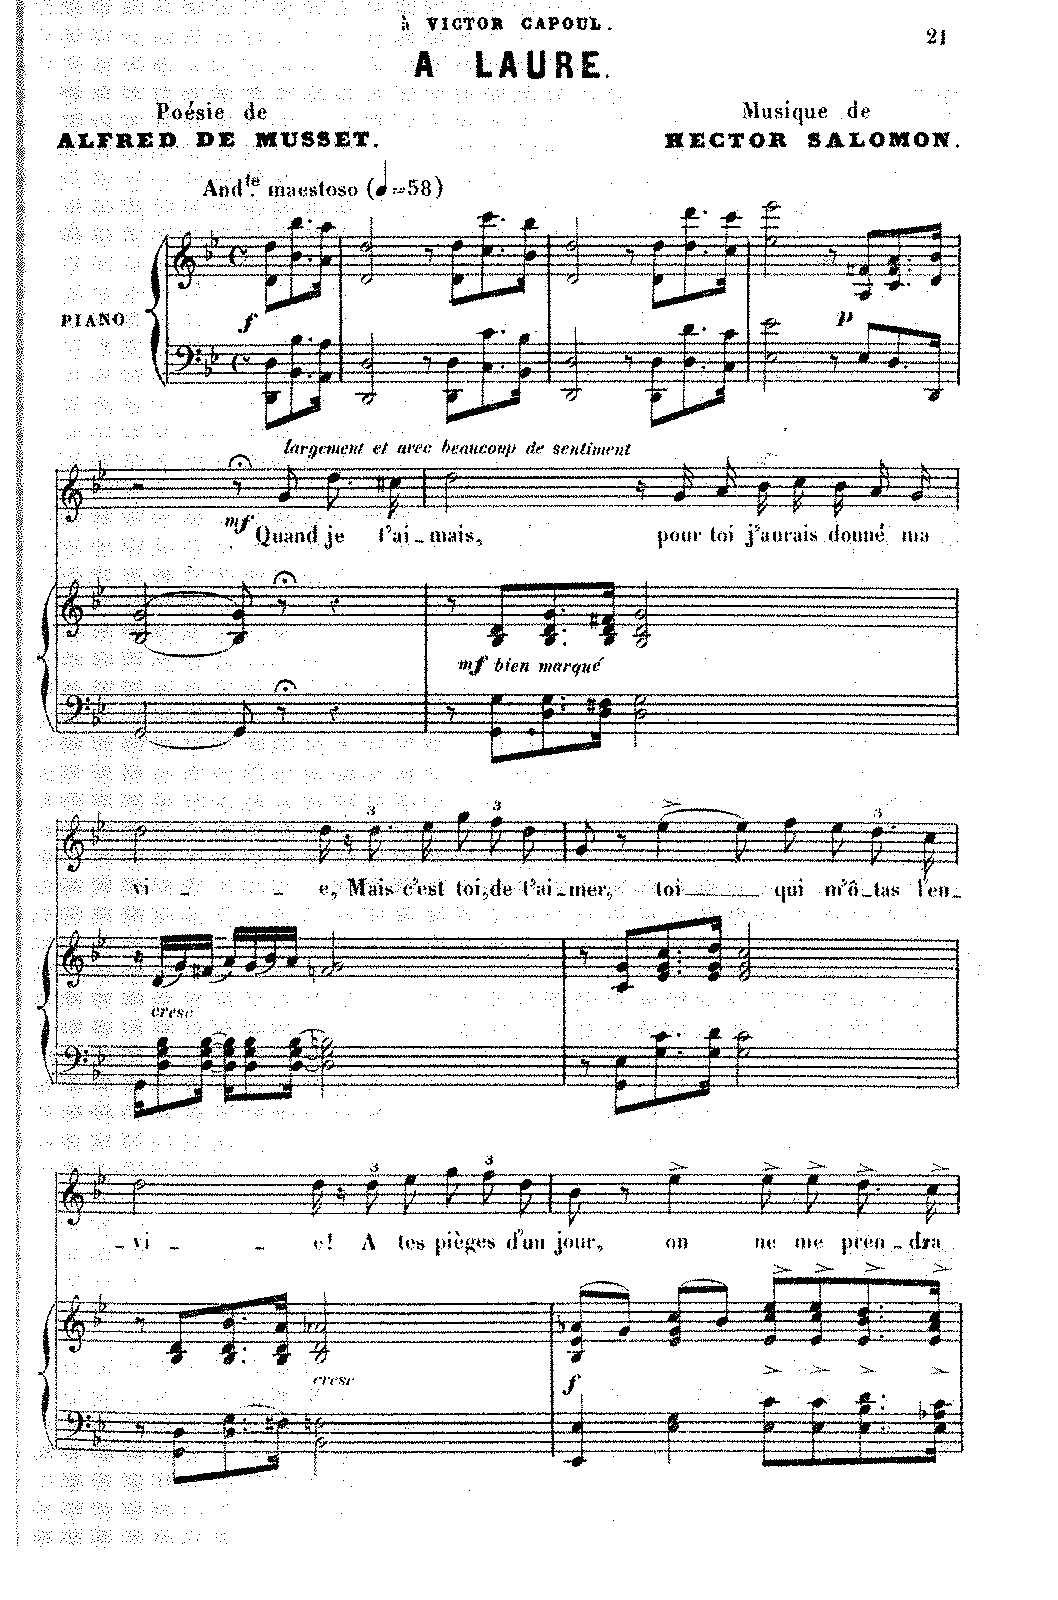 À Laure (Salomon, Hector) - IMSLP/Petrucci Music Library